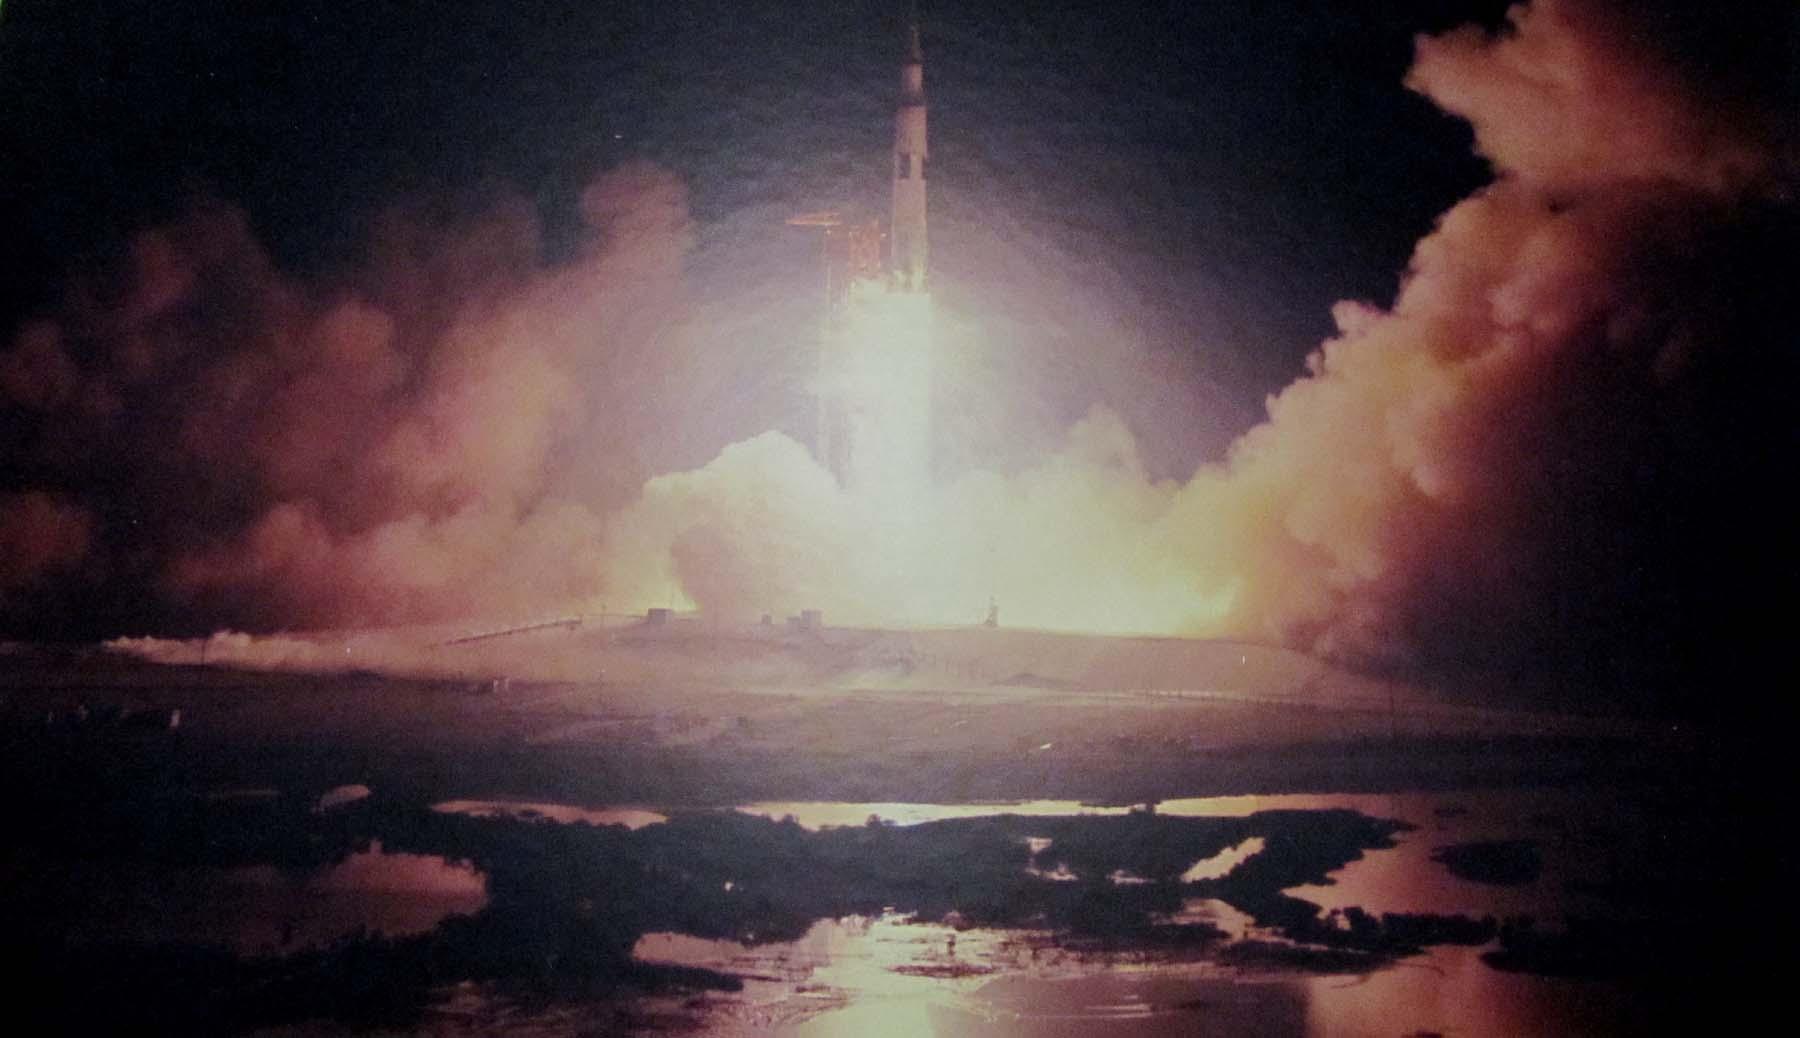 A rocket blasts off at night